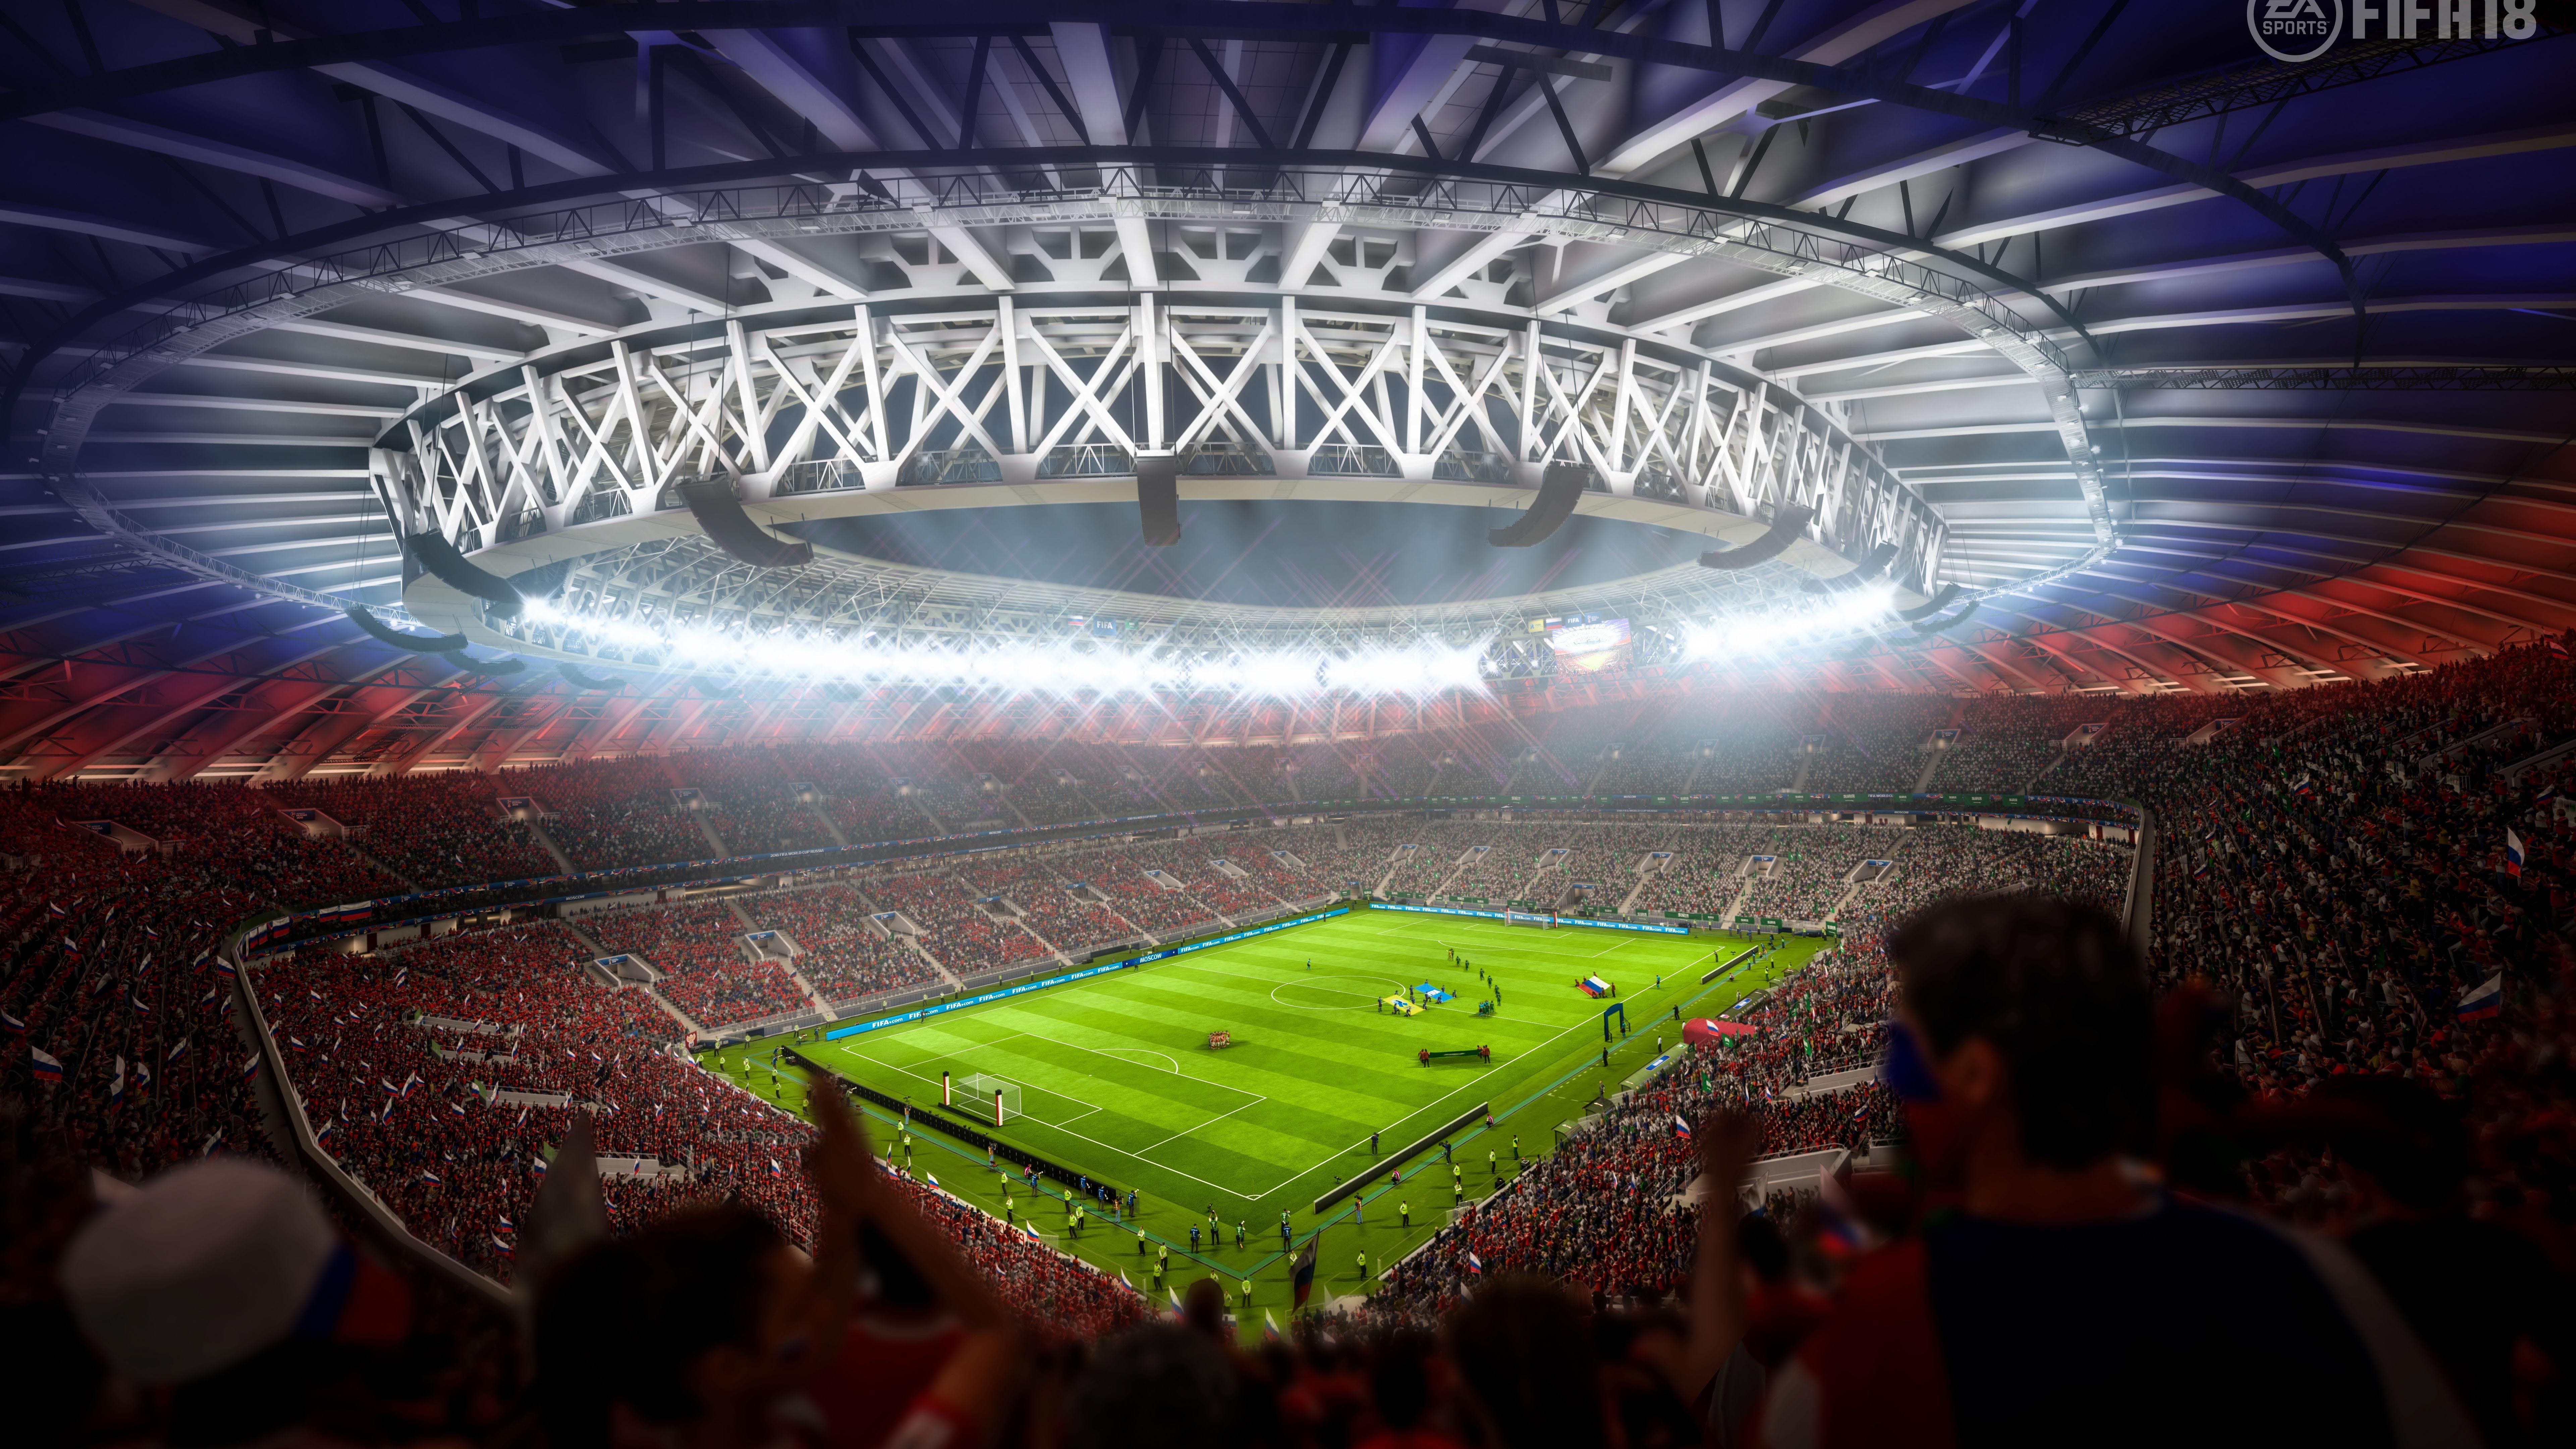 7680x4320 Fifa 18 Stadium 8k 8k HD 4k Wallpapers, Images